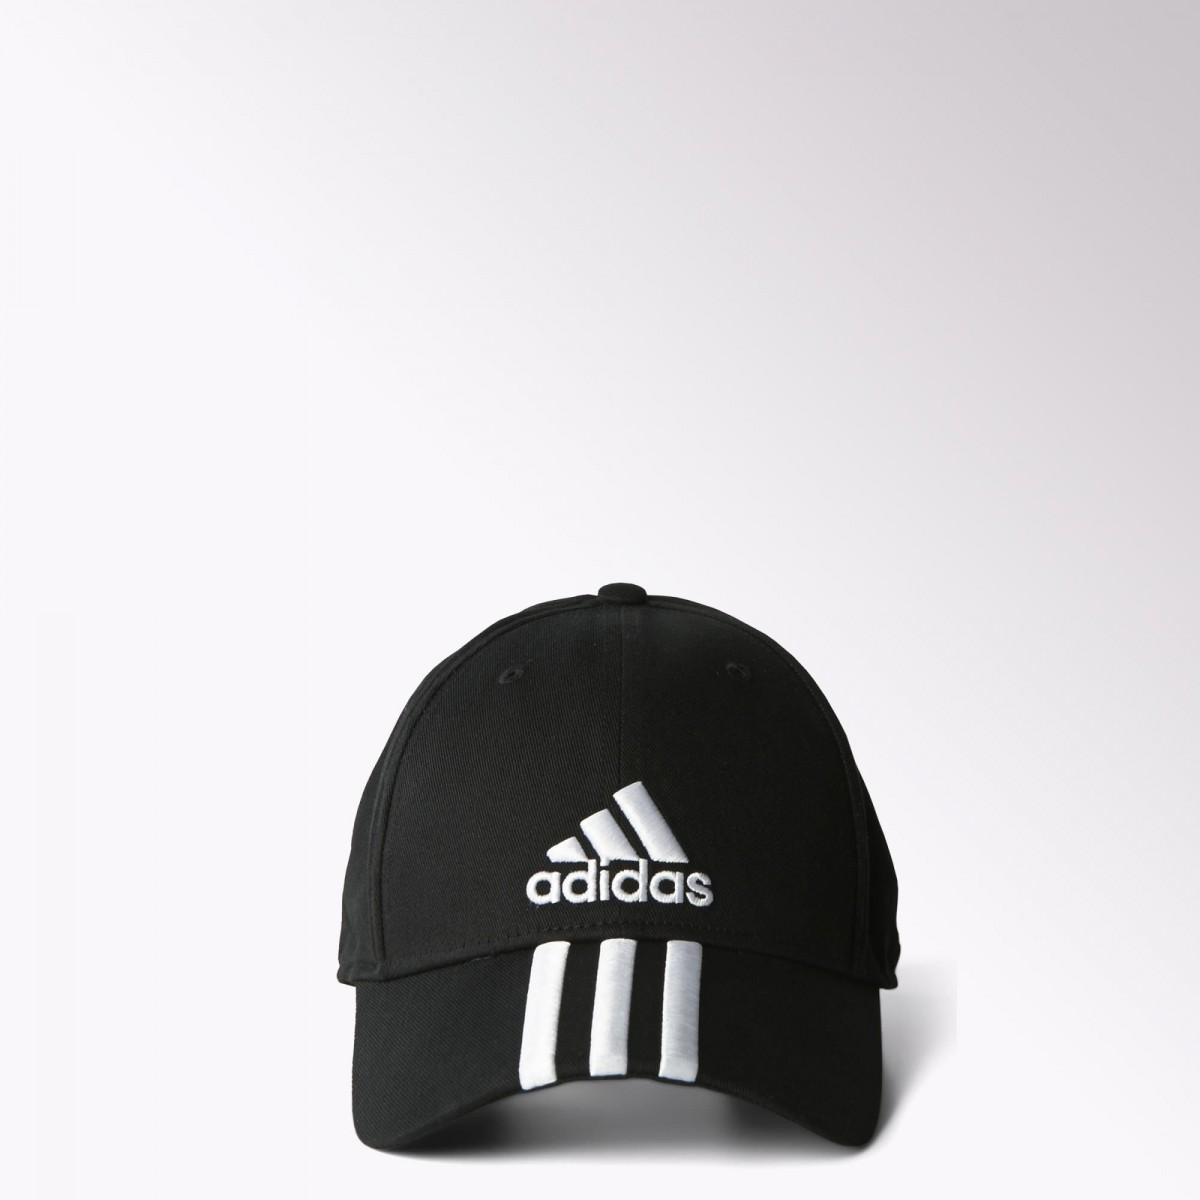 Bizz Store - Boné Adidas Perf Ess Cotton 3s Masculino Preto 7aa6d38be39